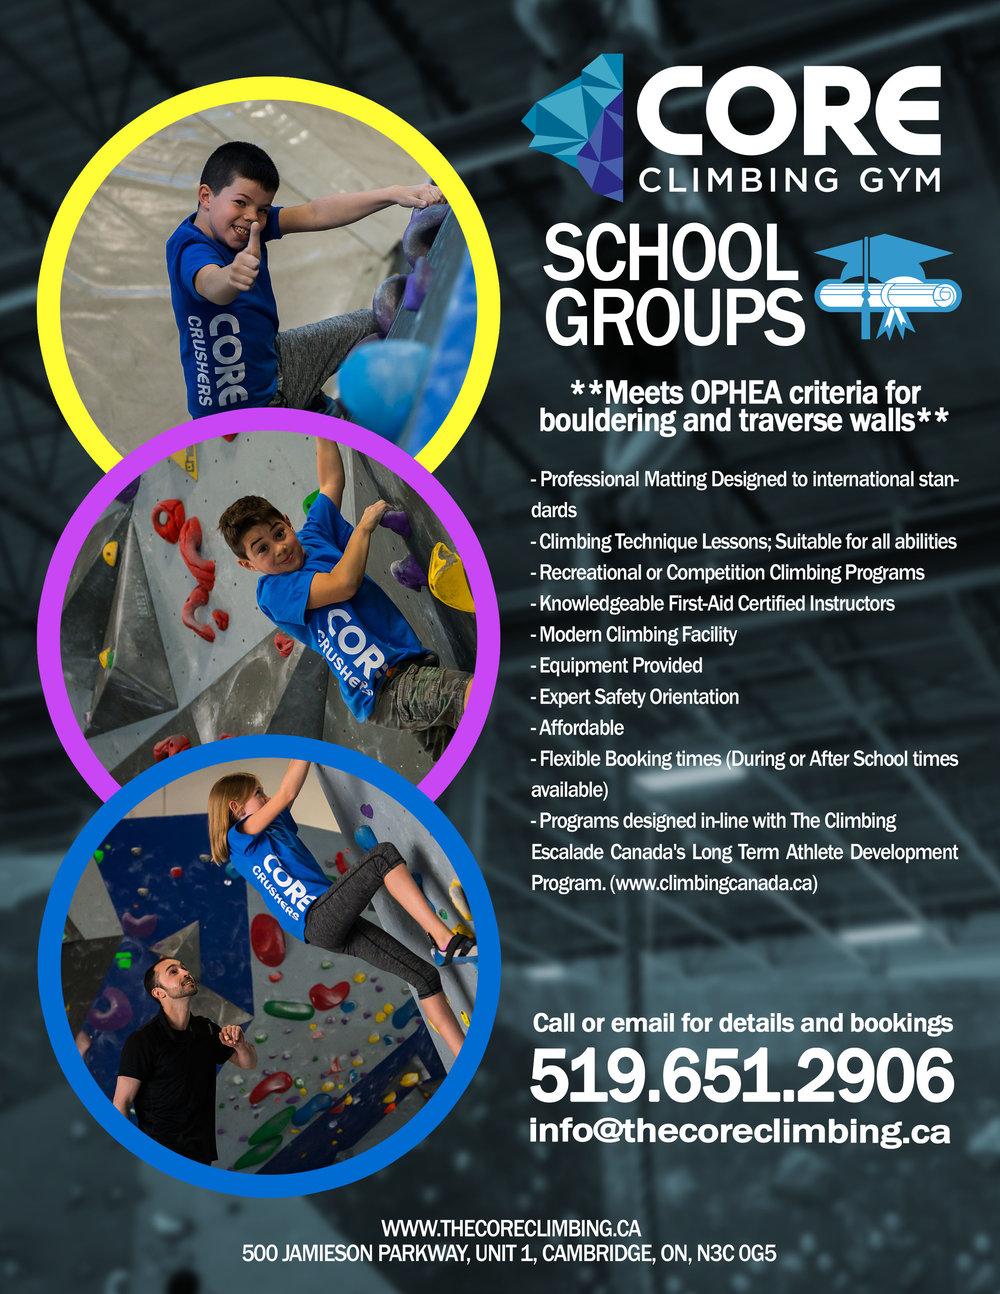 180812 - SCHOOL GROUPS.jpg